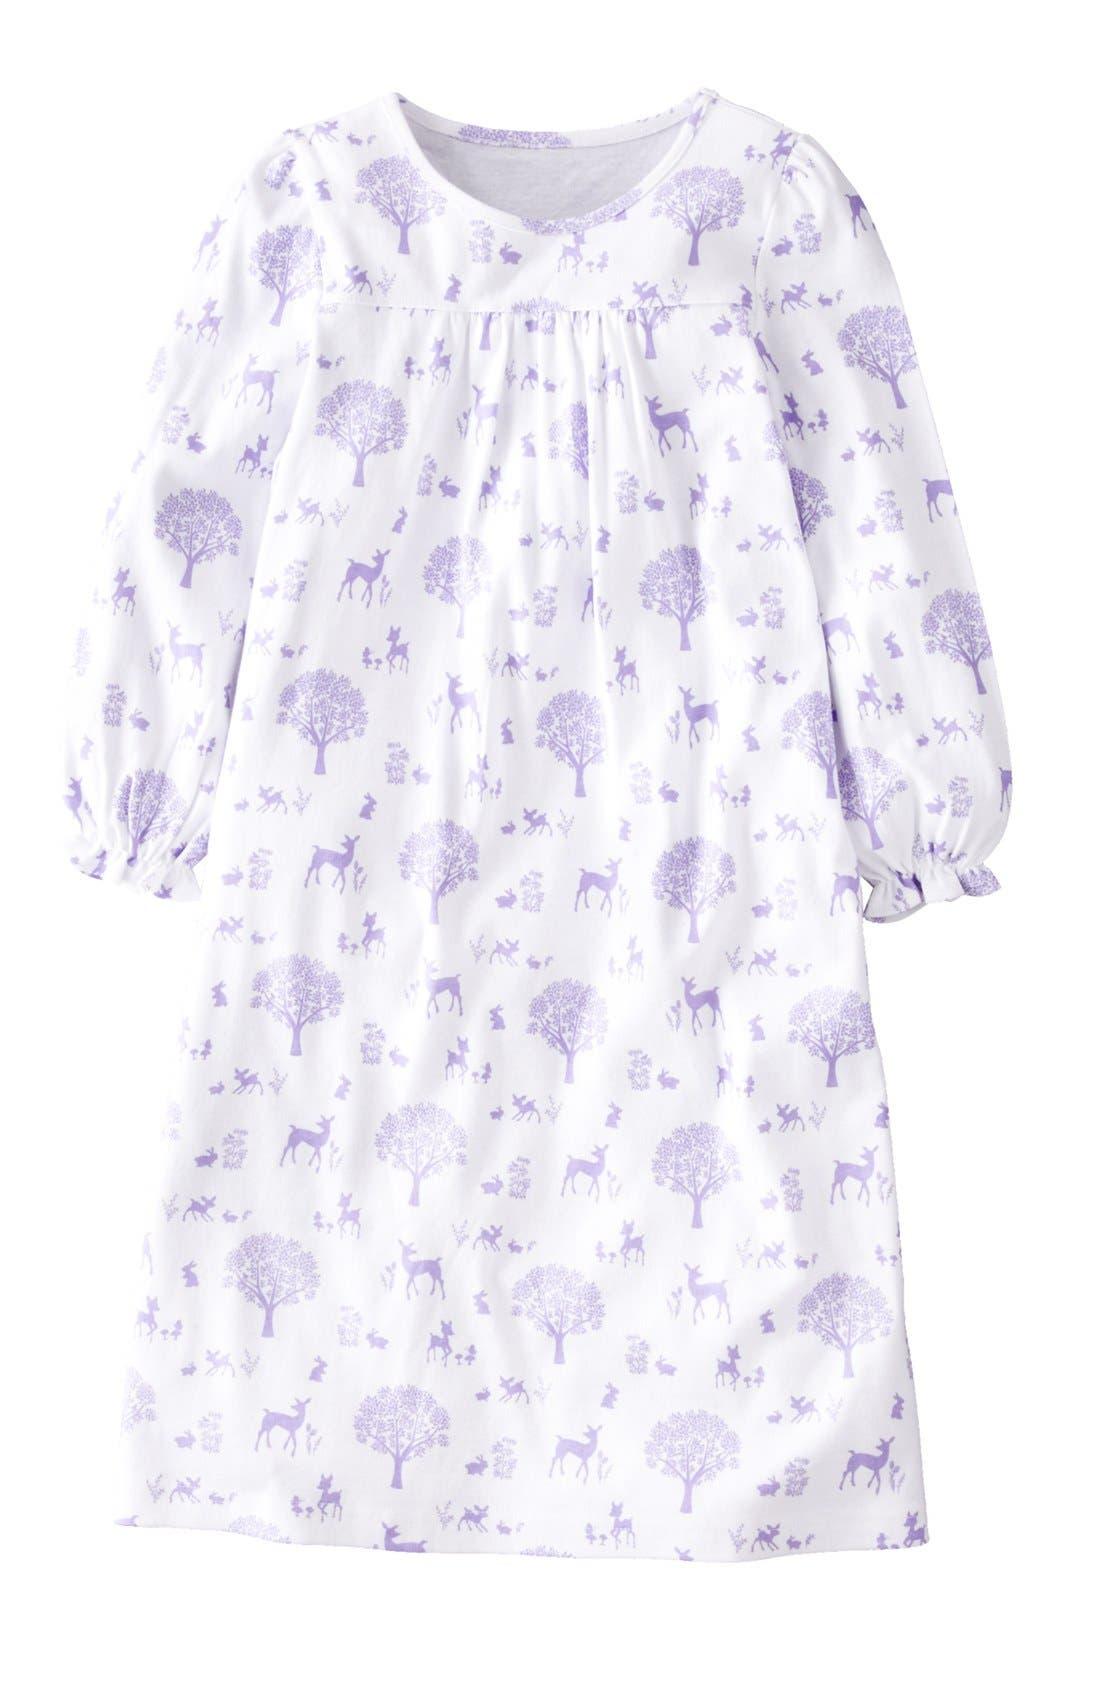 Alternate Image 1 Selected - Mini Boden Print Cotton Nightie (Little Girls & Big Girls)